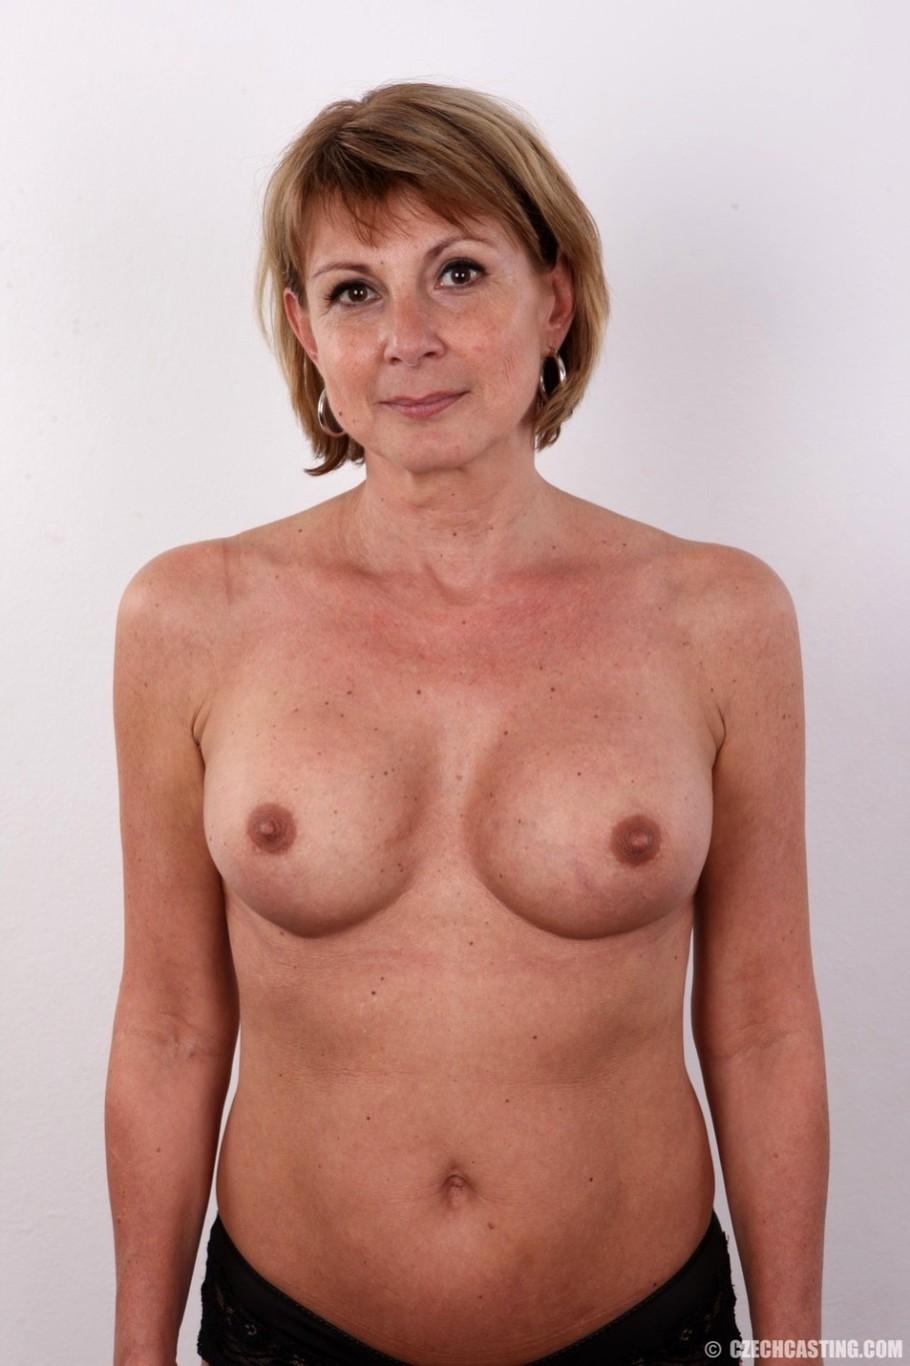 Babe Today Czech Casting Czechcasting Model Juicy Casting -9531